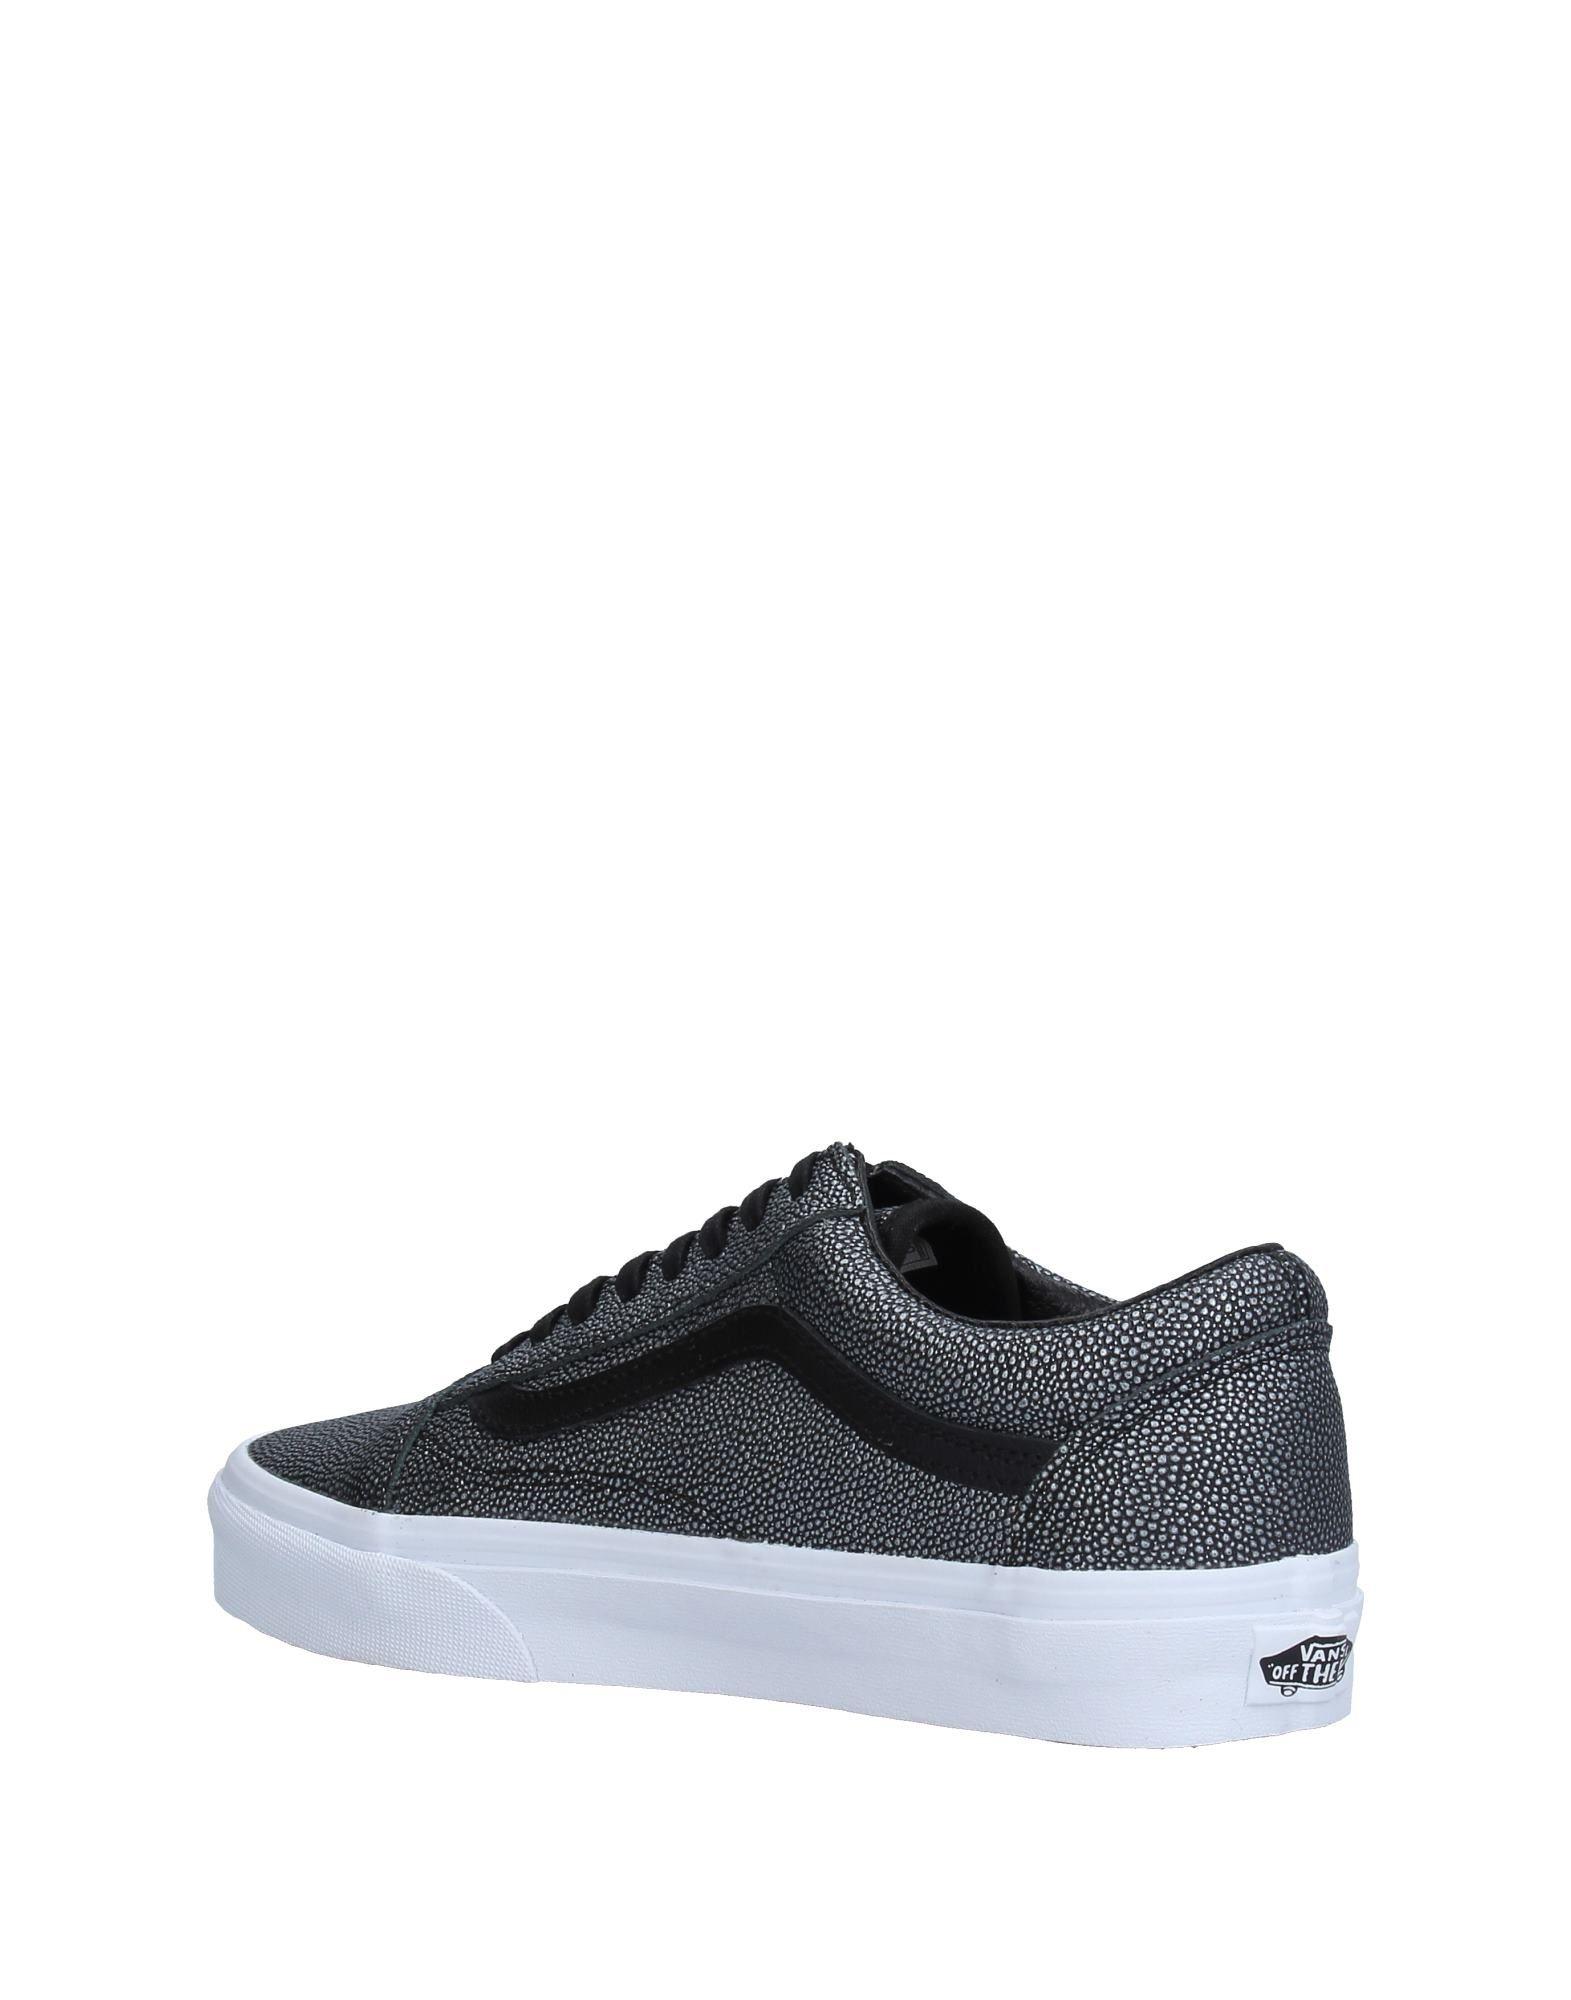 Vans Sneakers Gute Damen  11234605RN Gute Sneakers Qualität beliebte Schuhe c3b9bf